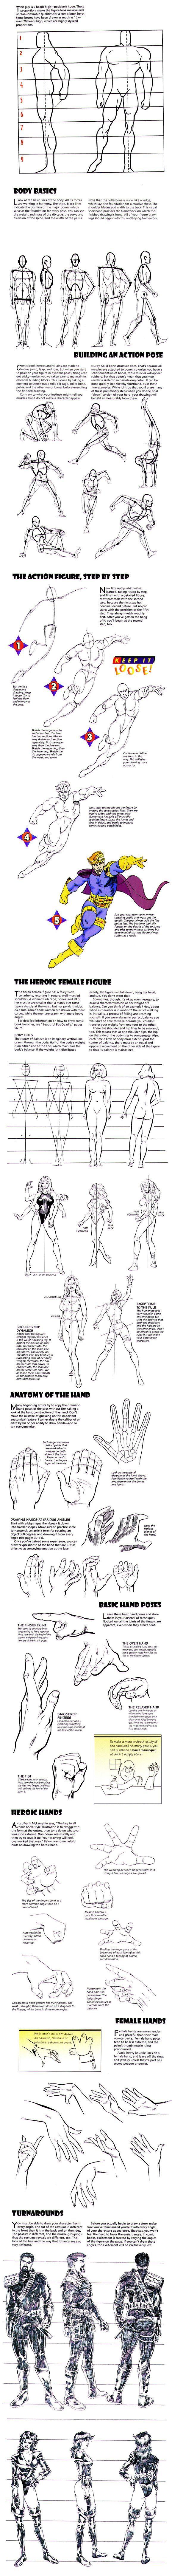 How to Draw Comics (2) https://www.facebook.com/CharacterDesignReferences